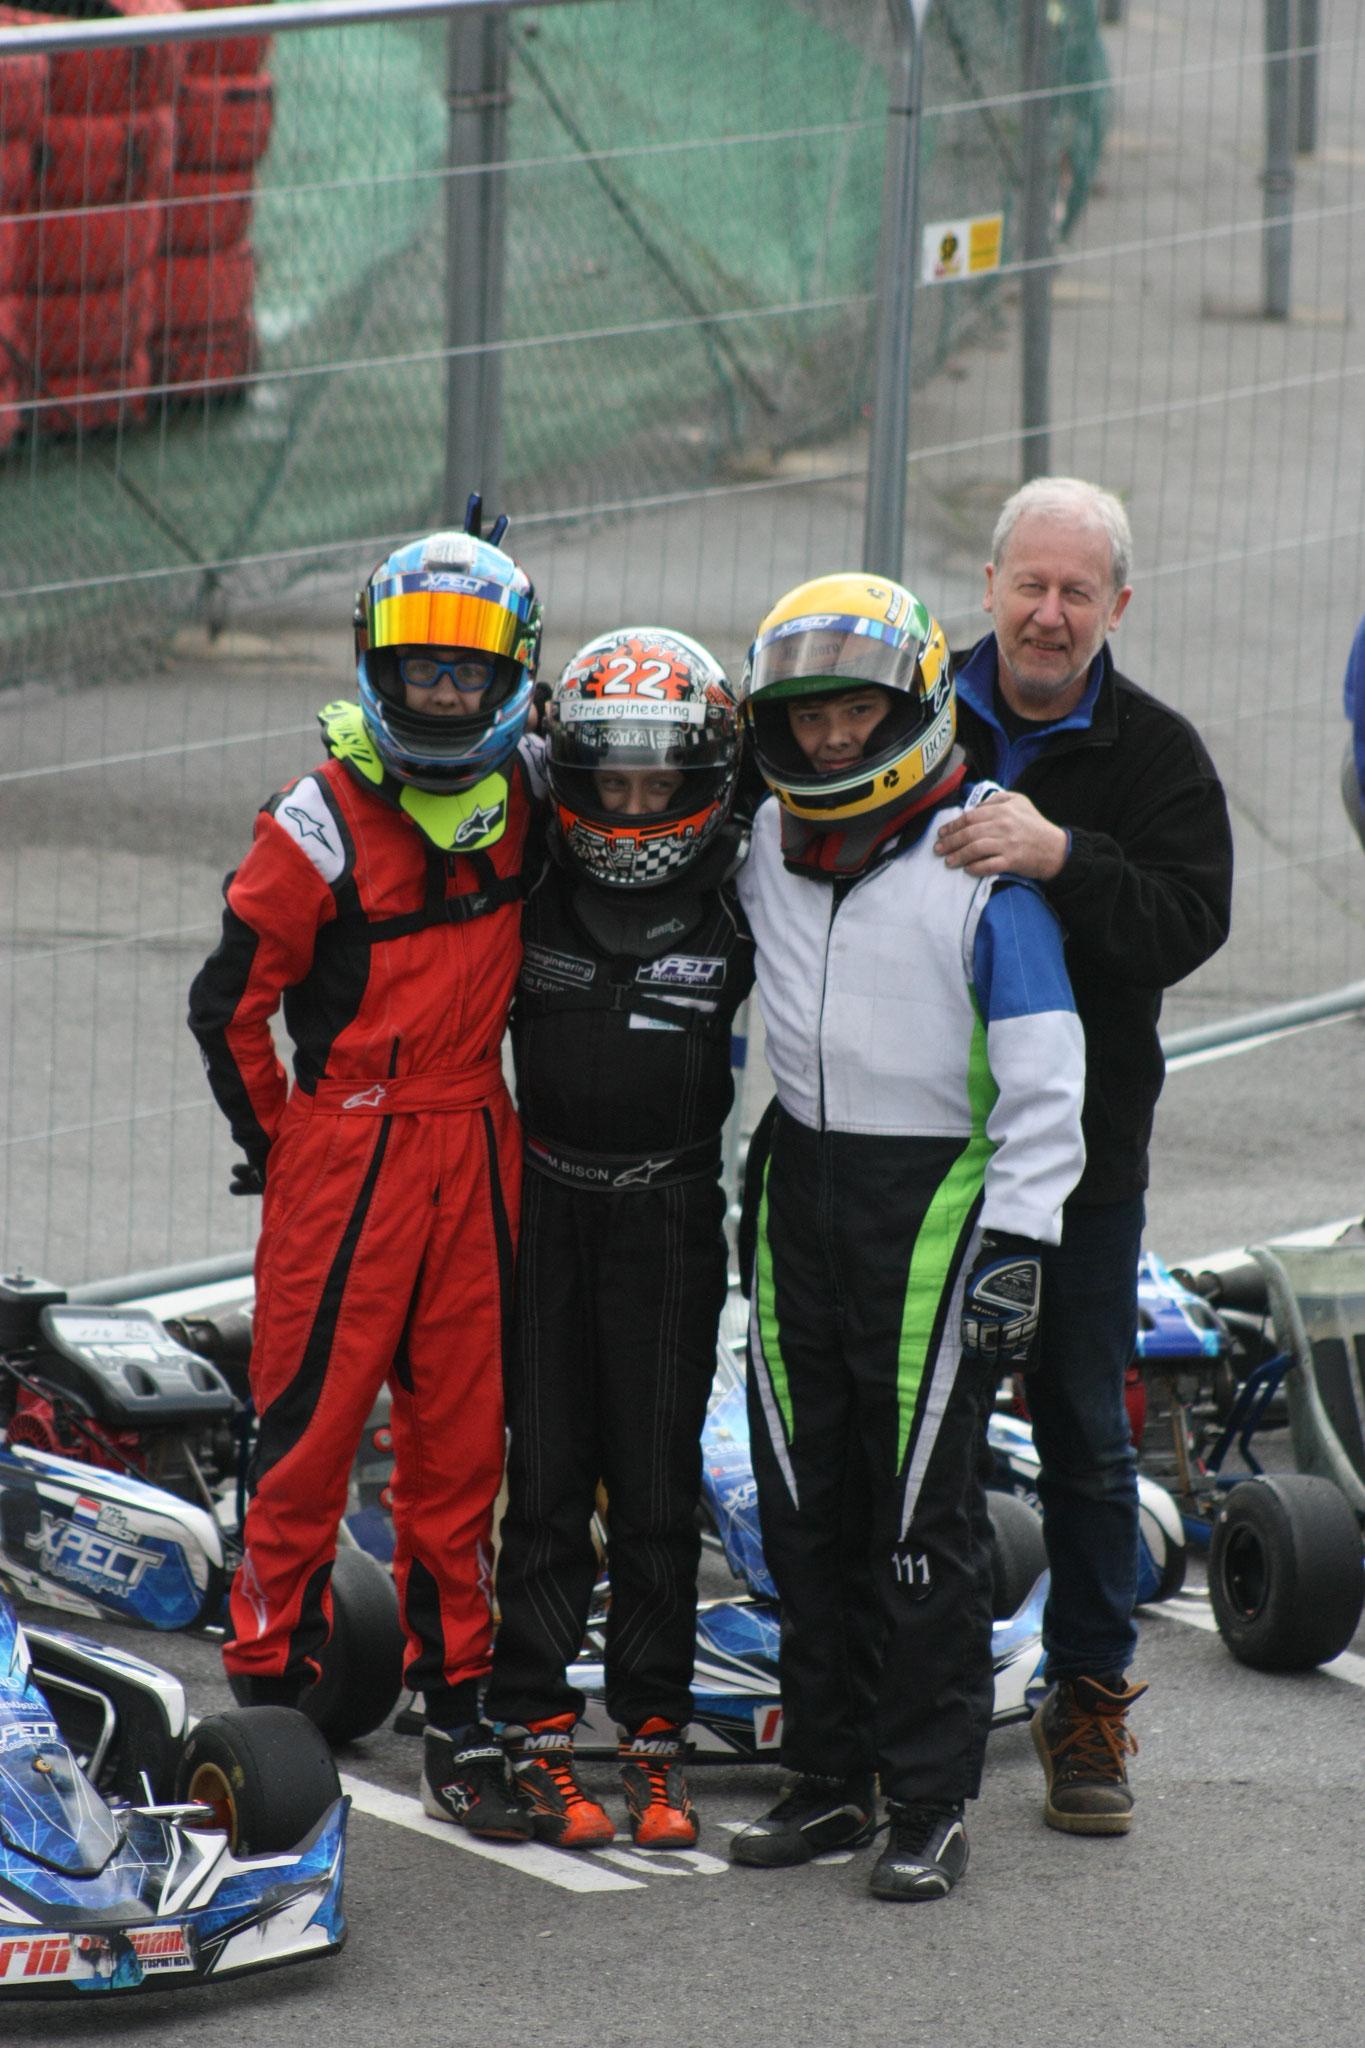 Formula Honda 9PK teamfoto....... Iano, Mika, Mika en Eddy....